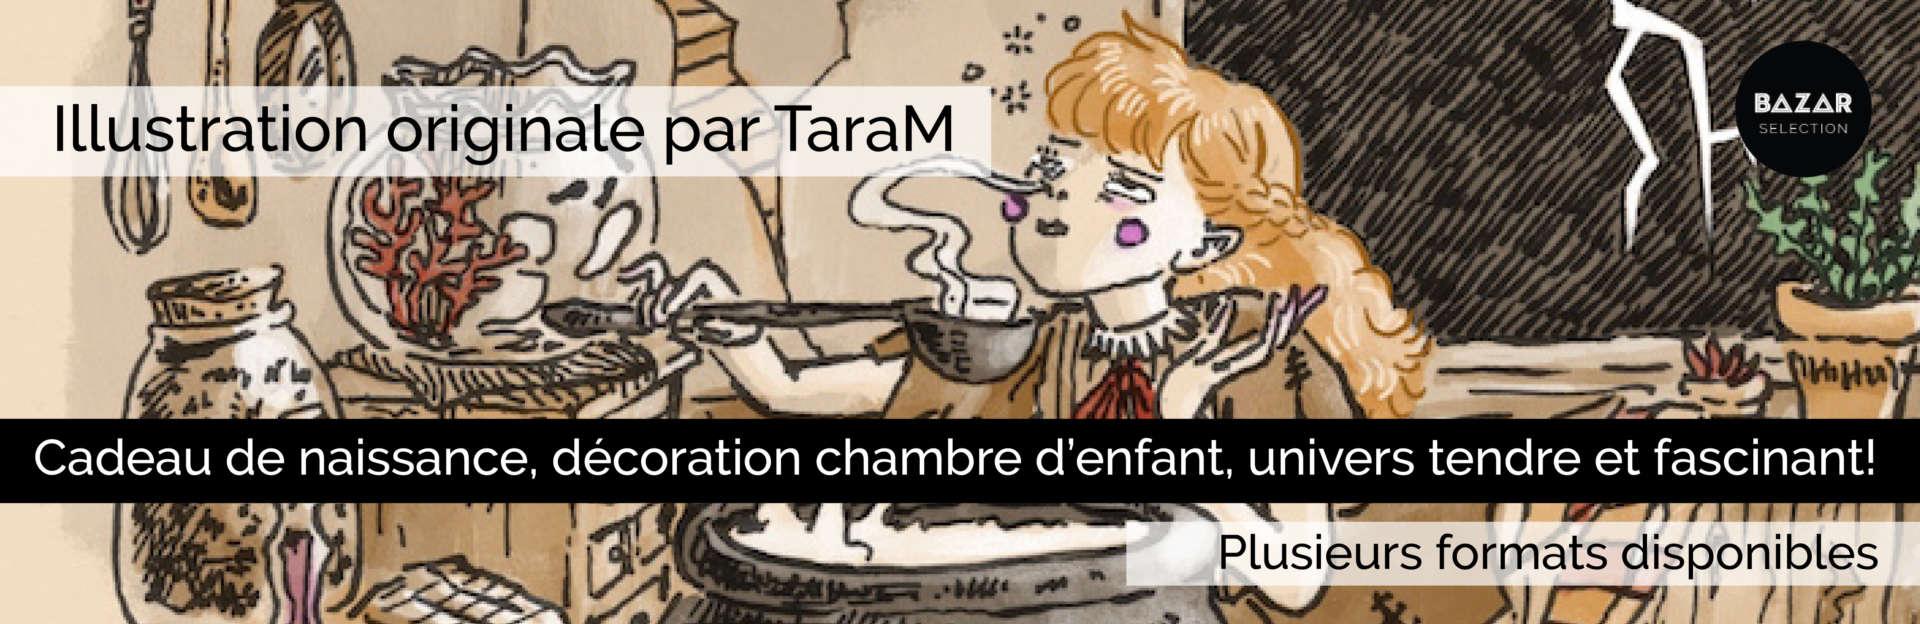 banner_bazar_e-shop_illustration_TaraM_2020_11_17